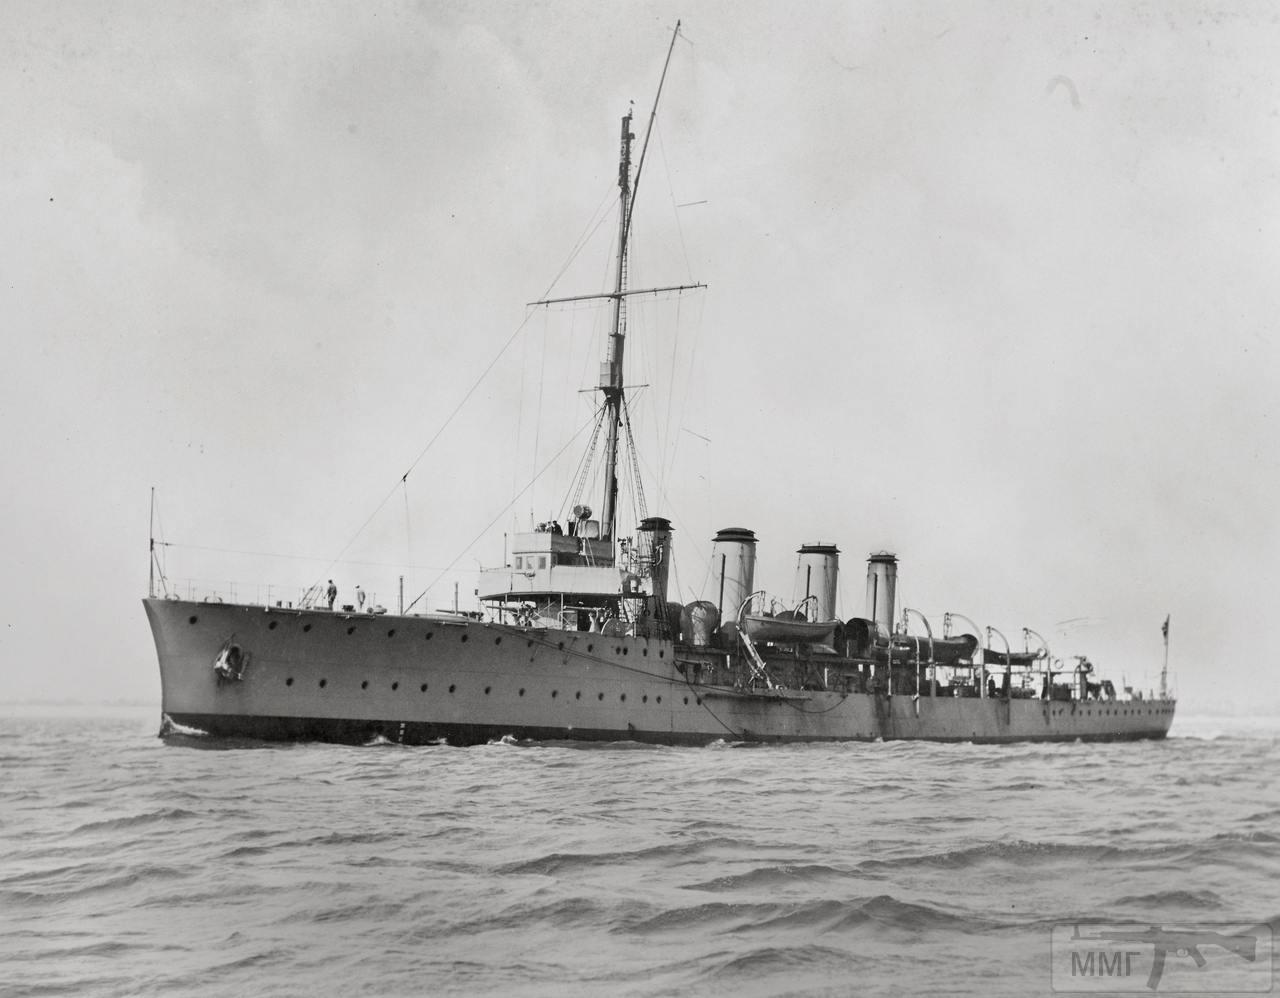 55453 - HMS Adventure